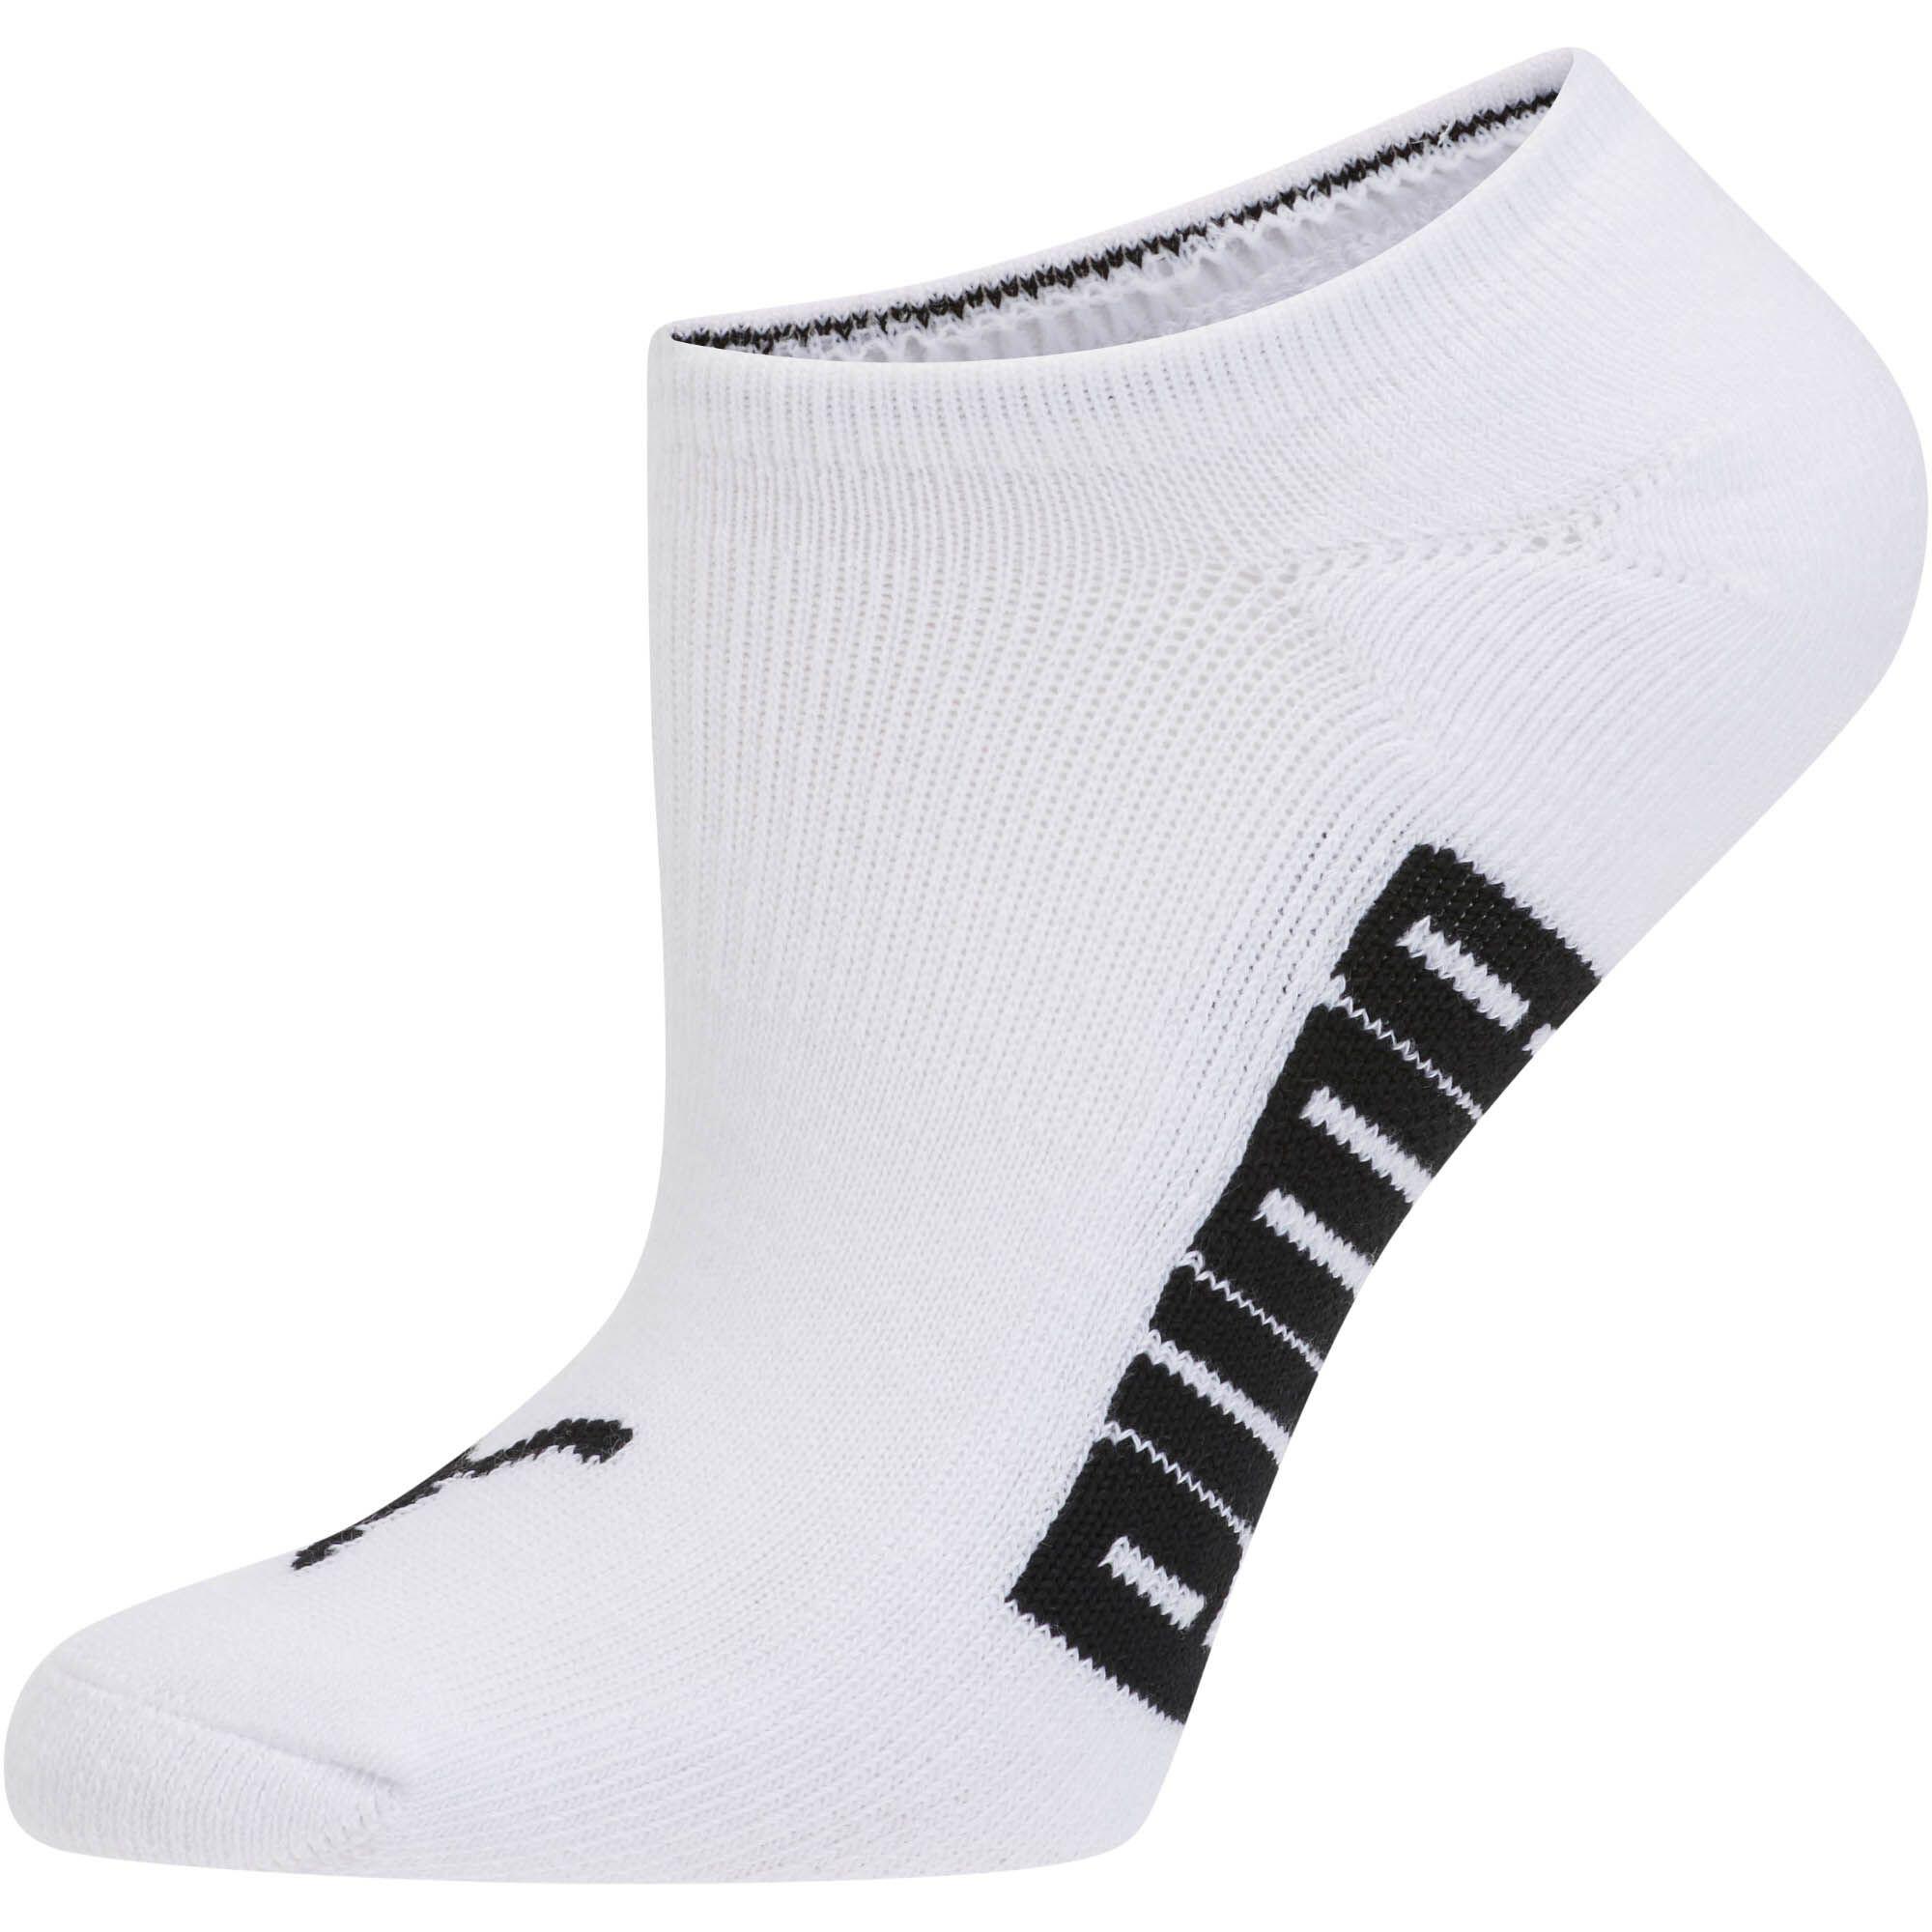 Licence-Women-s-Invisible-No-Show-Socks-3-Pack-Women-Socks-3-Pack thumbnail 5